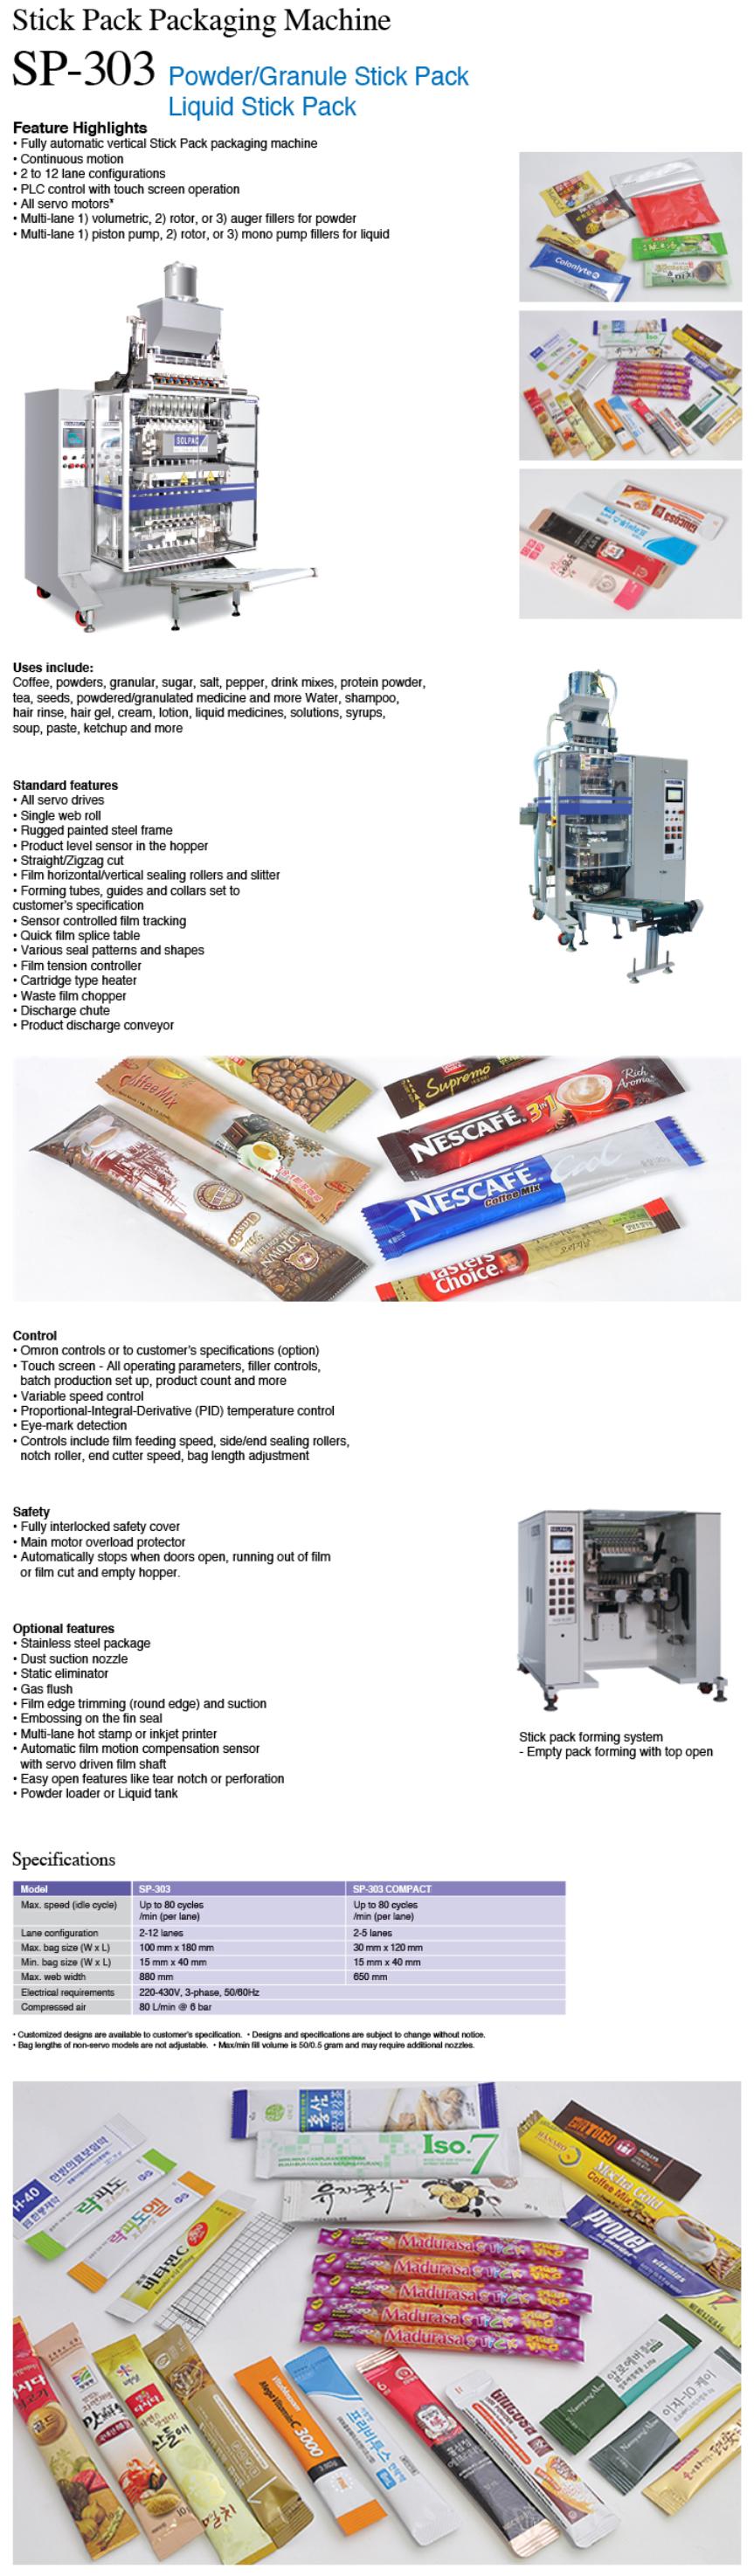 SOLPAC PACKAGING SOLUTION Stick Pack Packaging Machine (Powder / Granule Stick Pack Liquid Stick Pack) SP-303